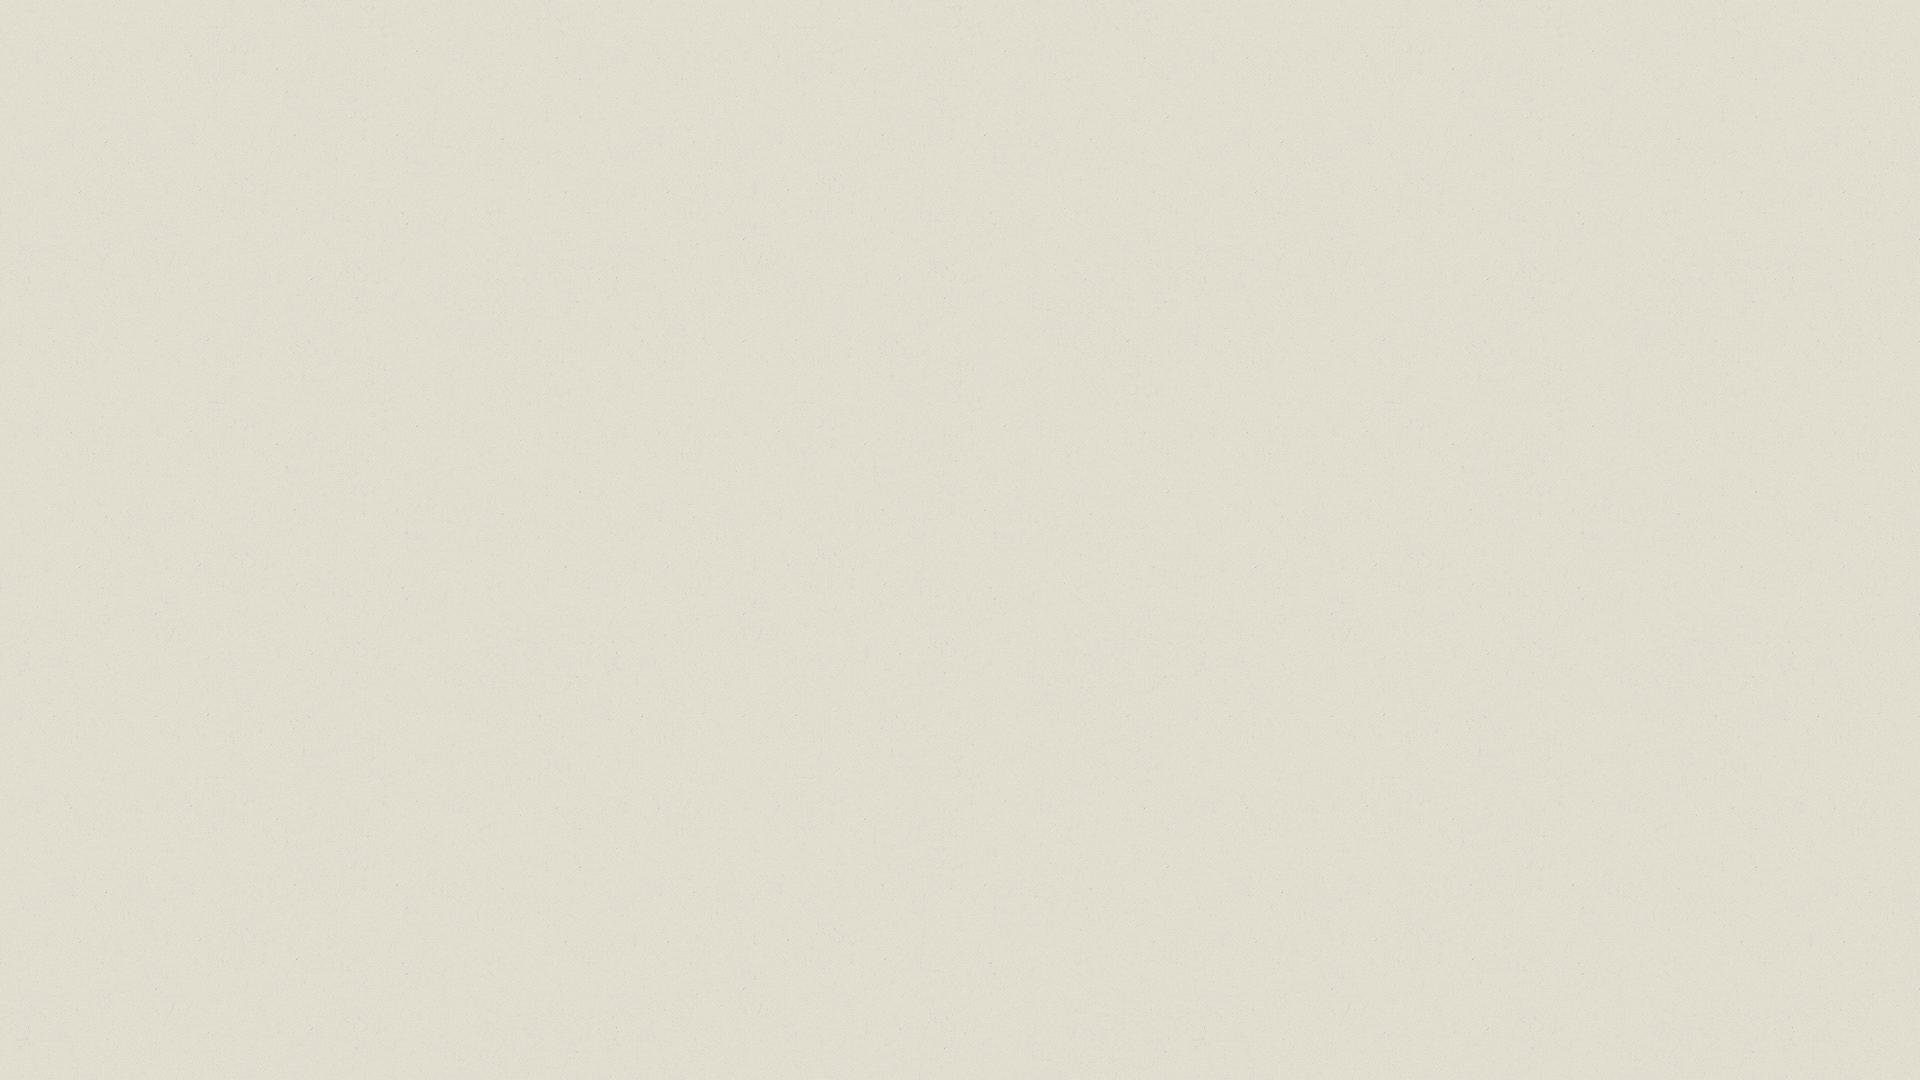 Bedge Grunge 1920x1080 American Dream Restoration Llc